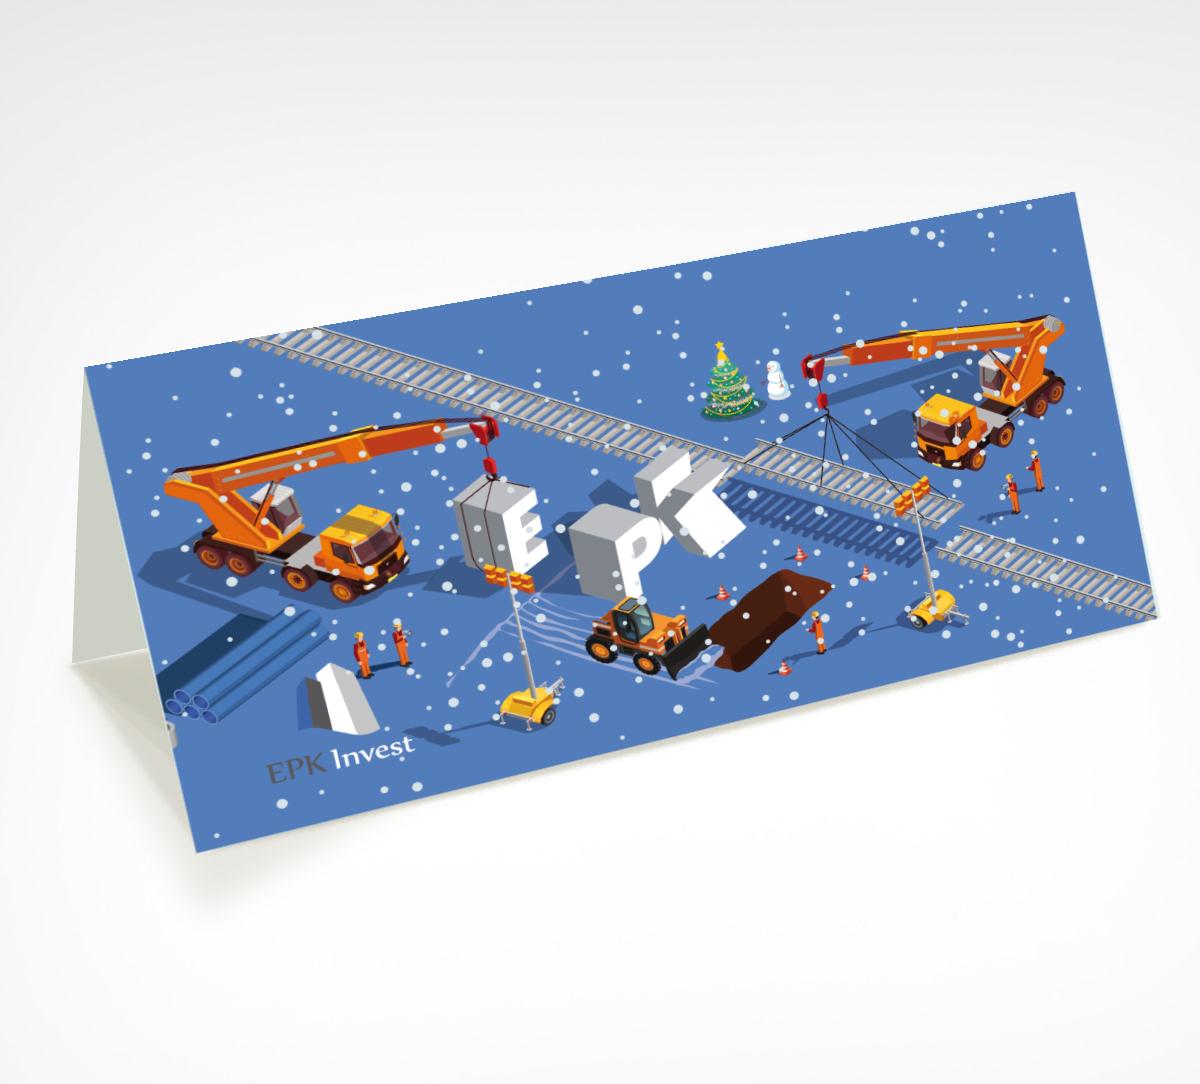 joulukaardi disain kujundamine trükk epkinvest mock big